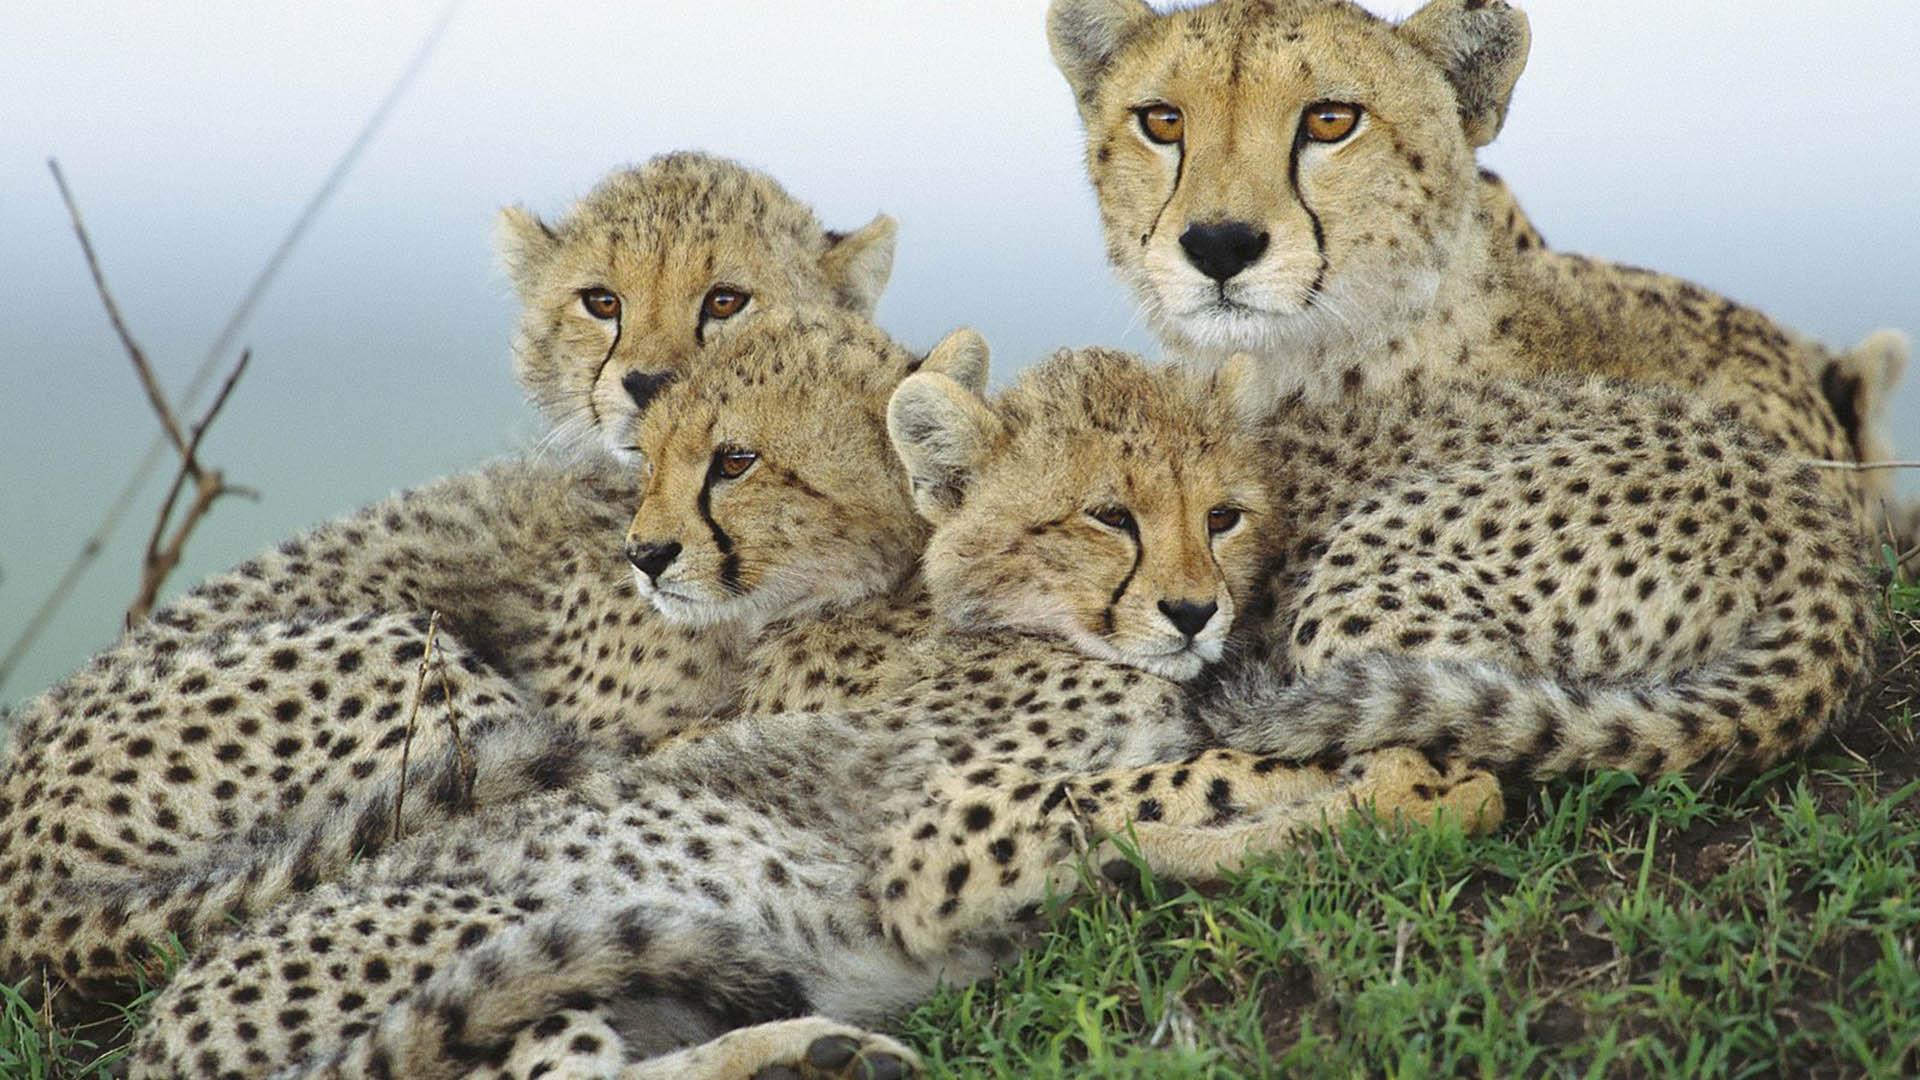 Baby Cheetah Wallpaper Images - Wickedsa com